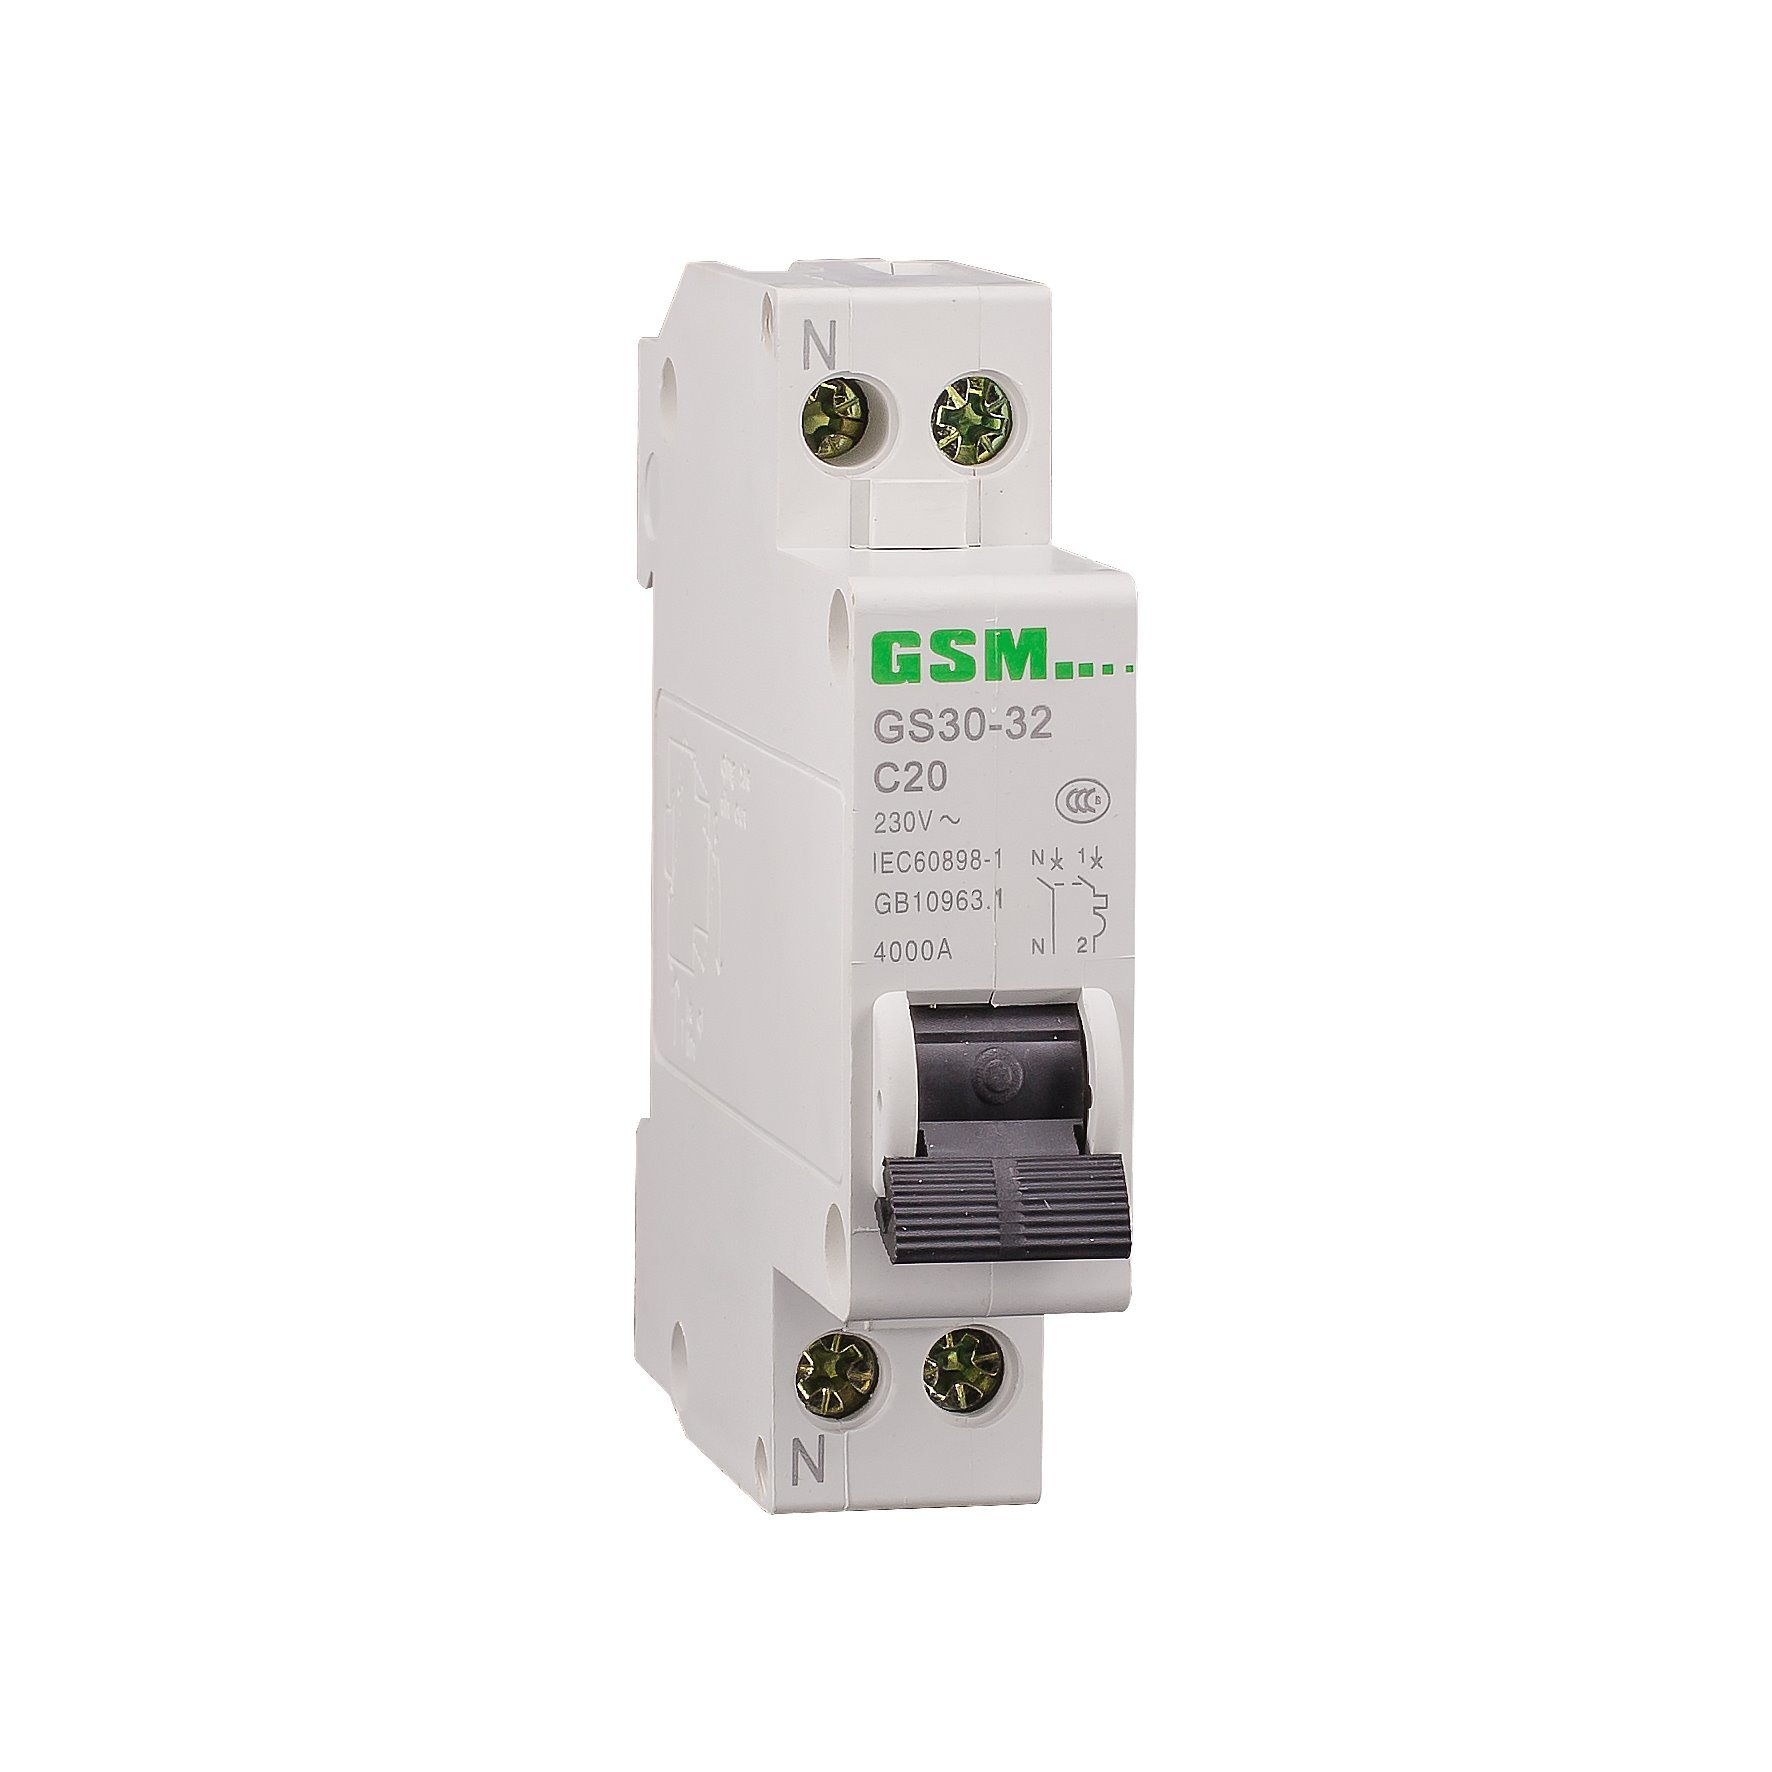 Miniature Circuit Breaker GS30-32